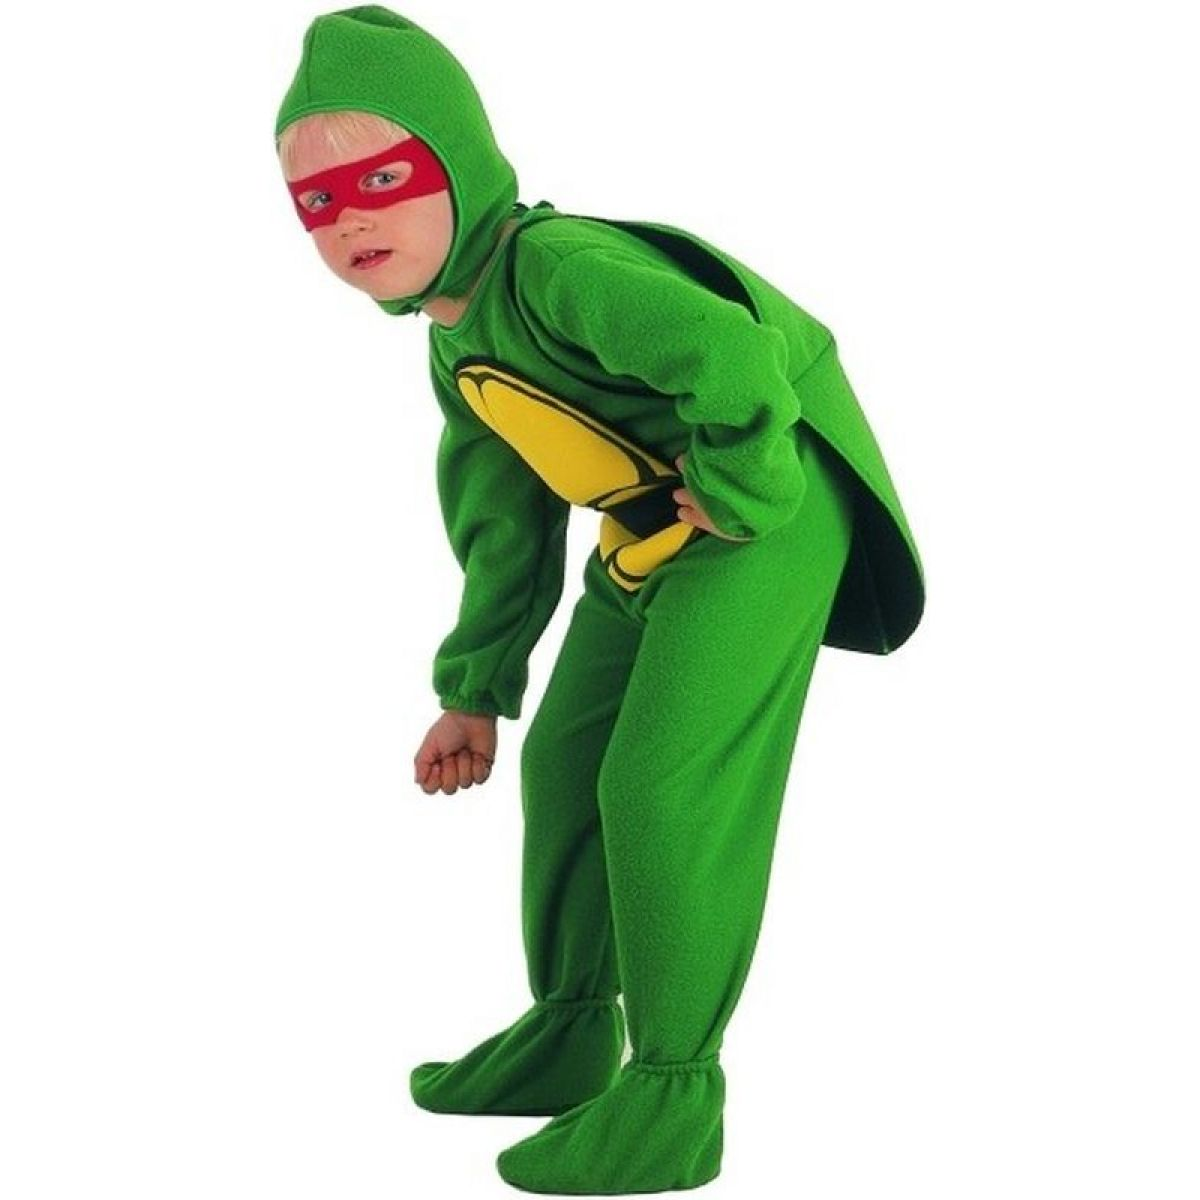 Made Dětský kostým Želva 92-104cm